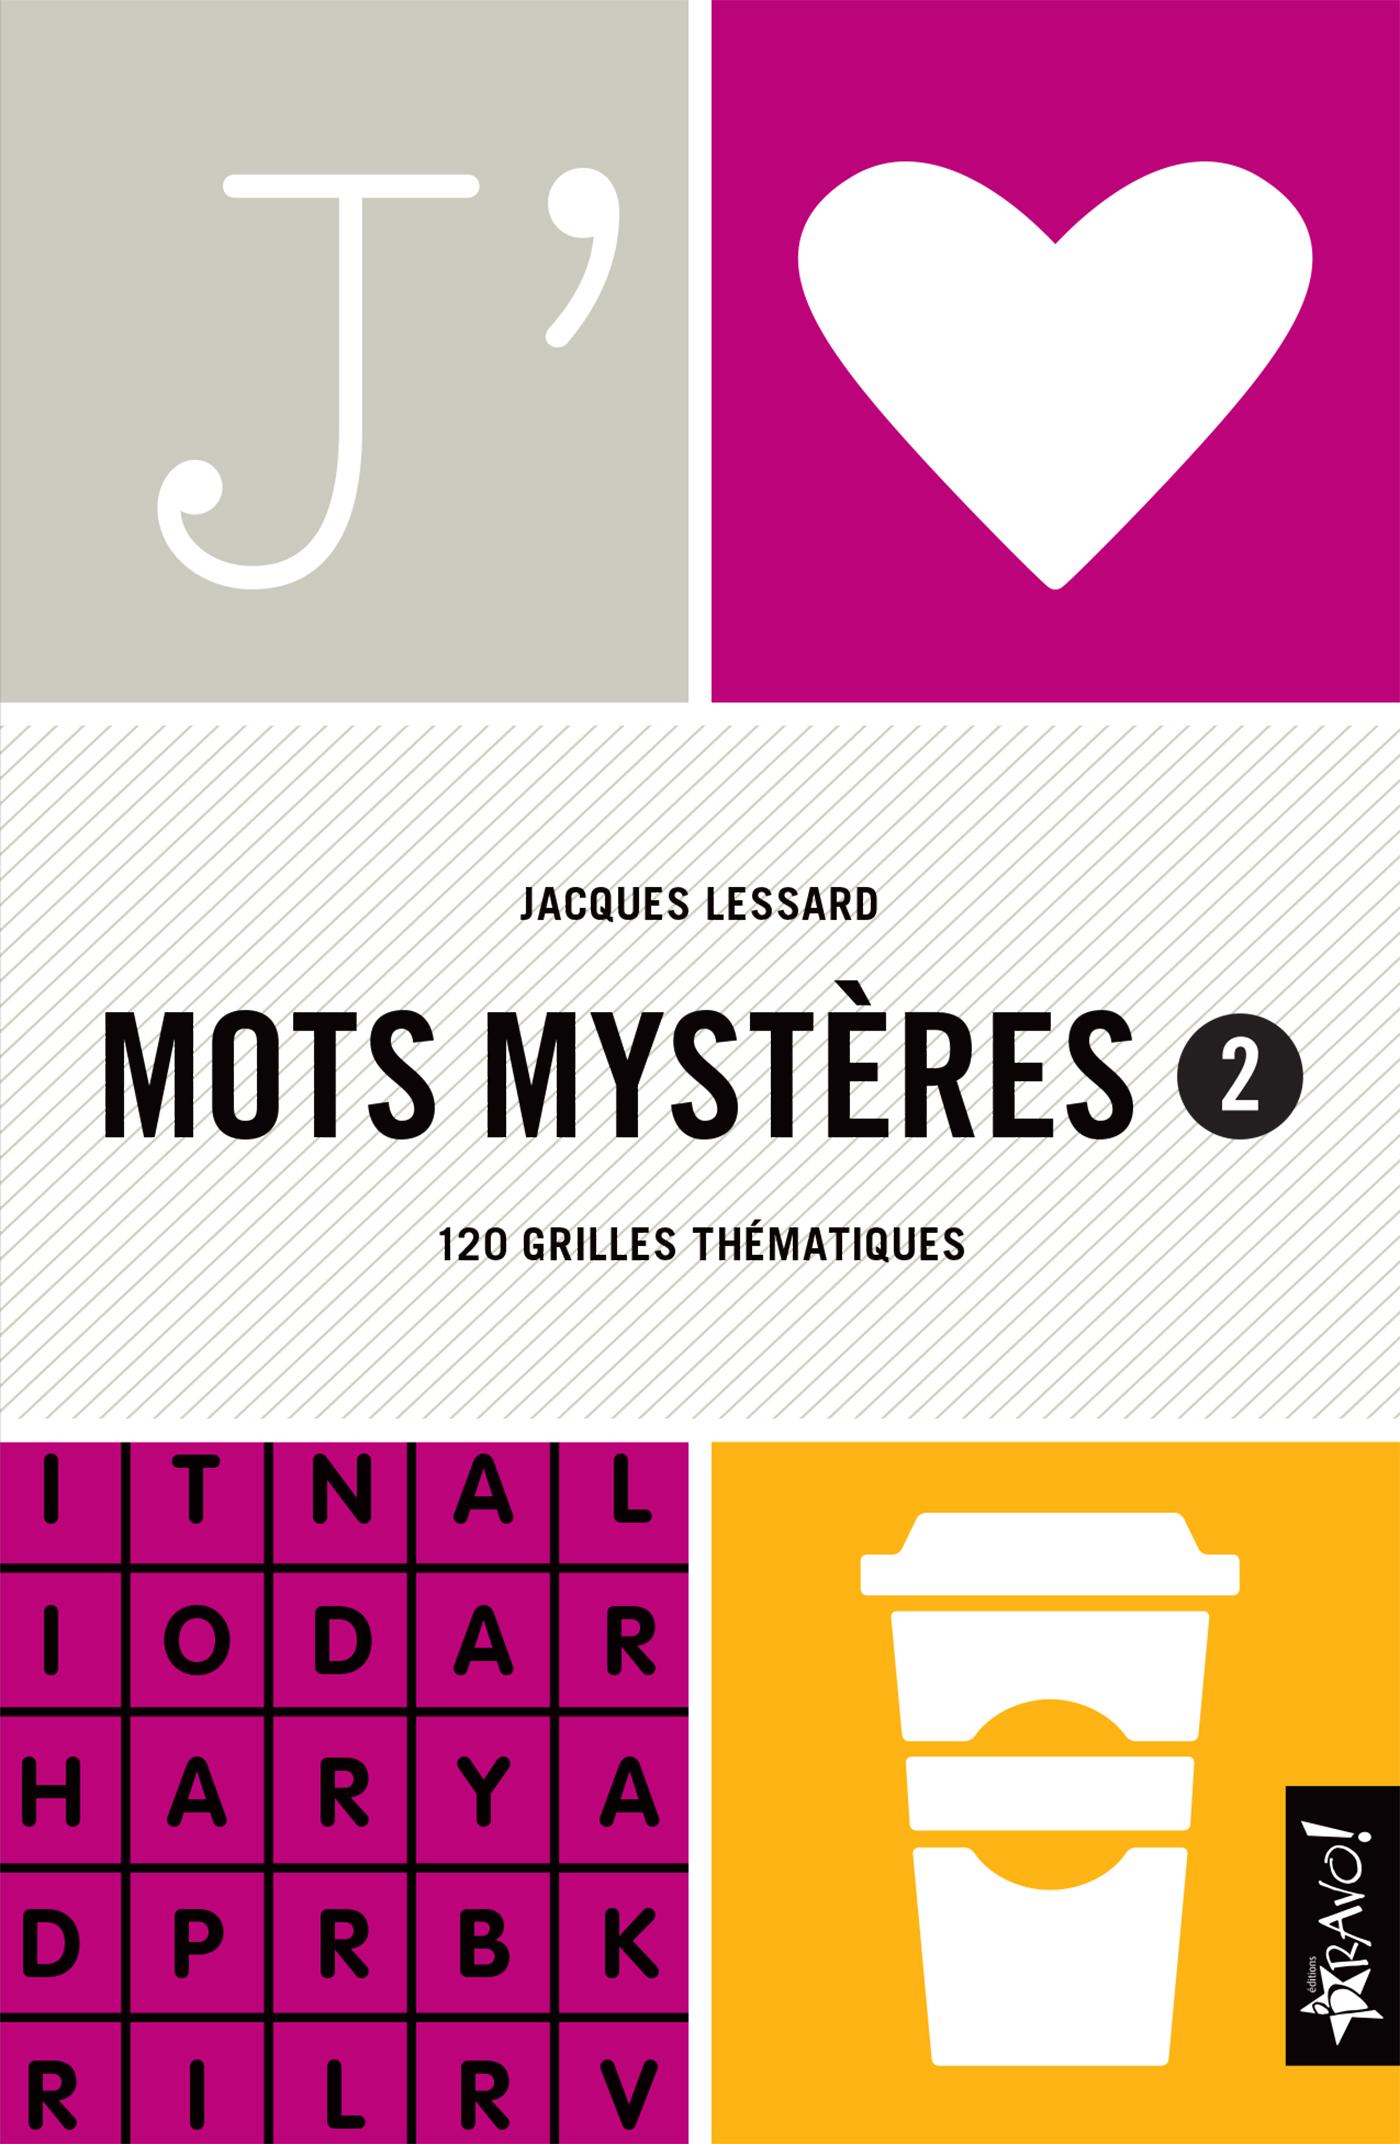 303_JaimeMotsMysteres2-C1